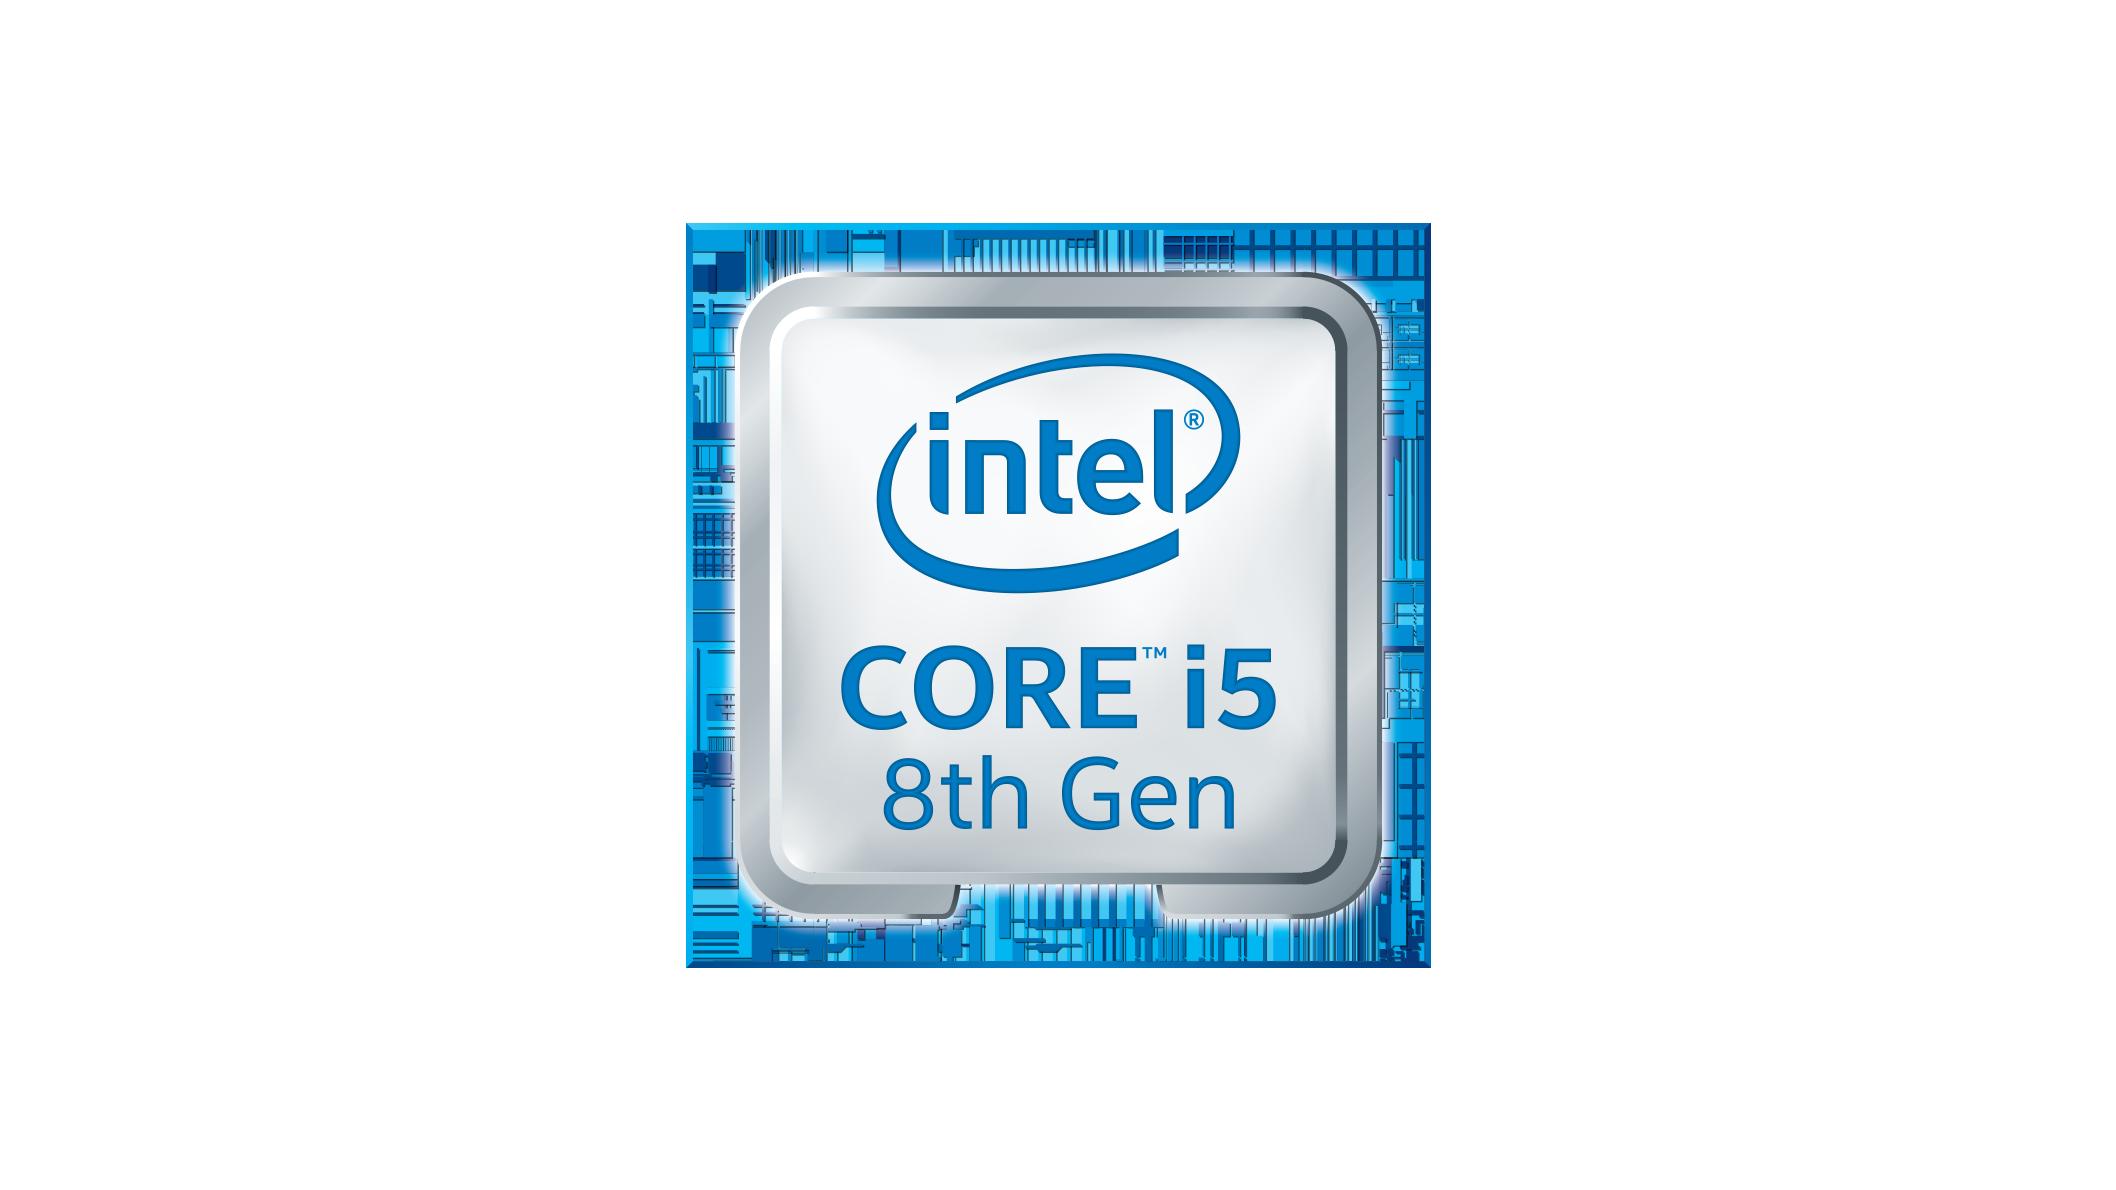 Intel Core i5 8th Gen logo